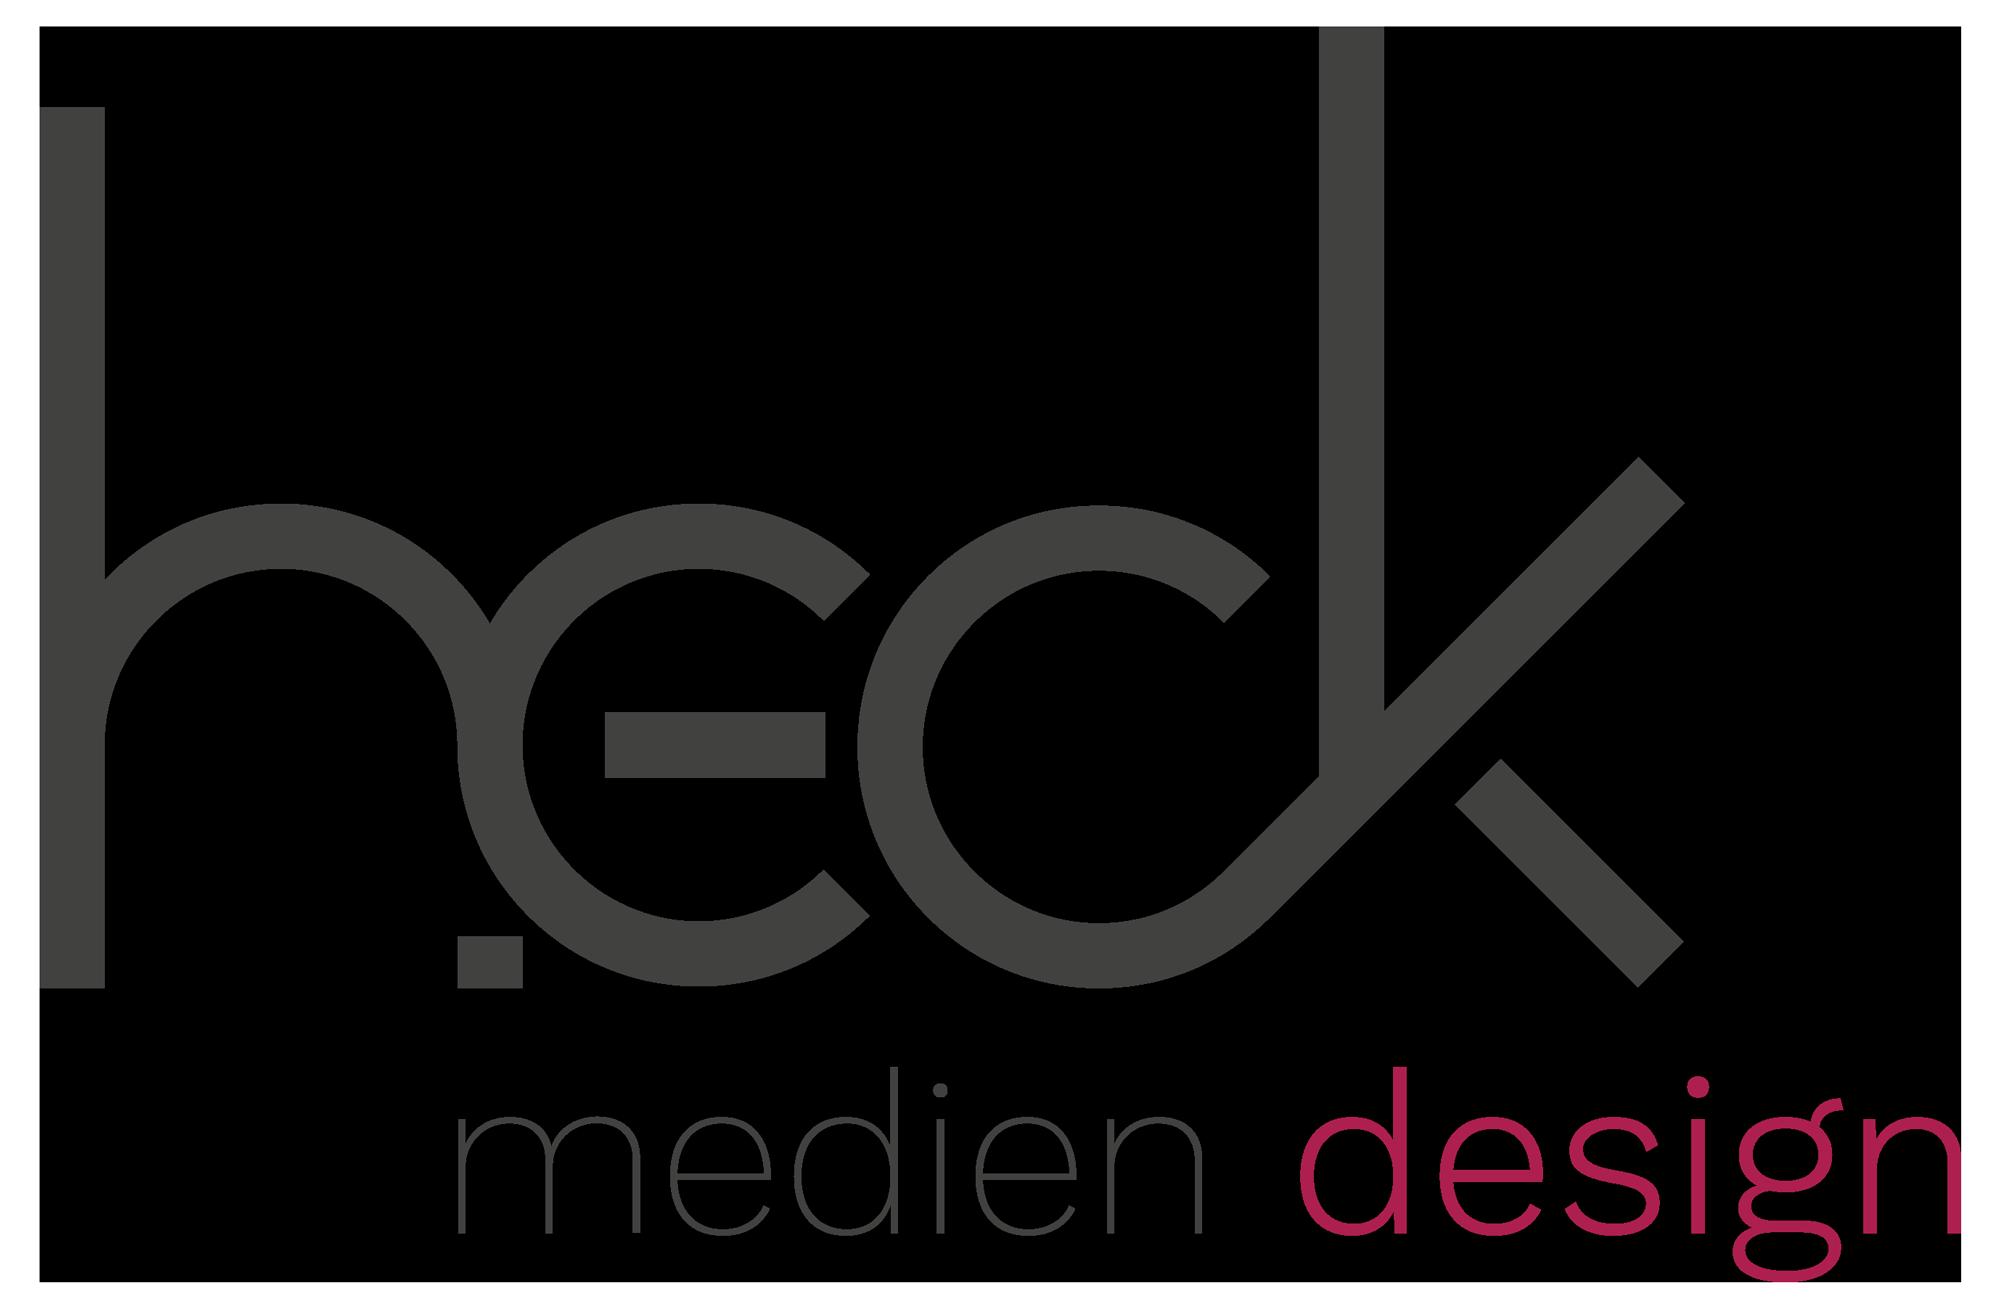 Heck Medien Design e.U.